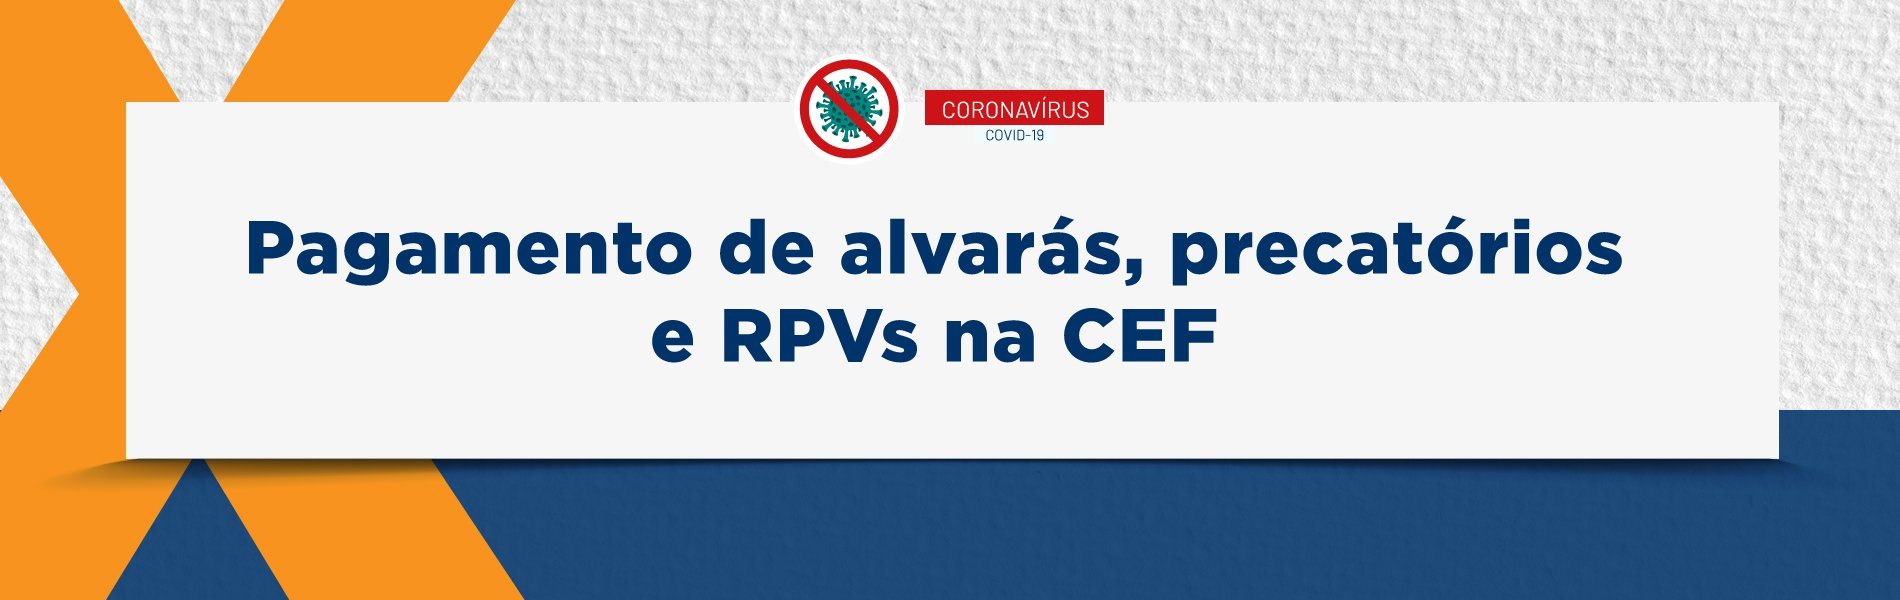 [Coronavírus: Pagamento de alvarás, precatórios e RPVs na CEF]